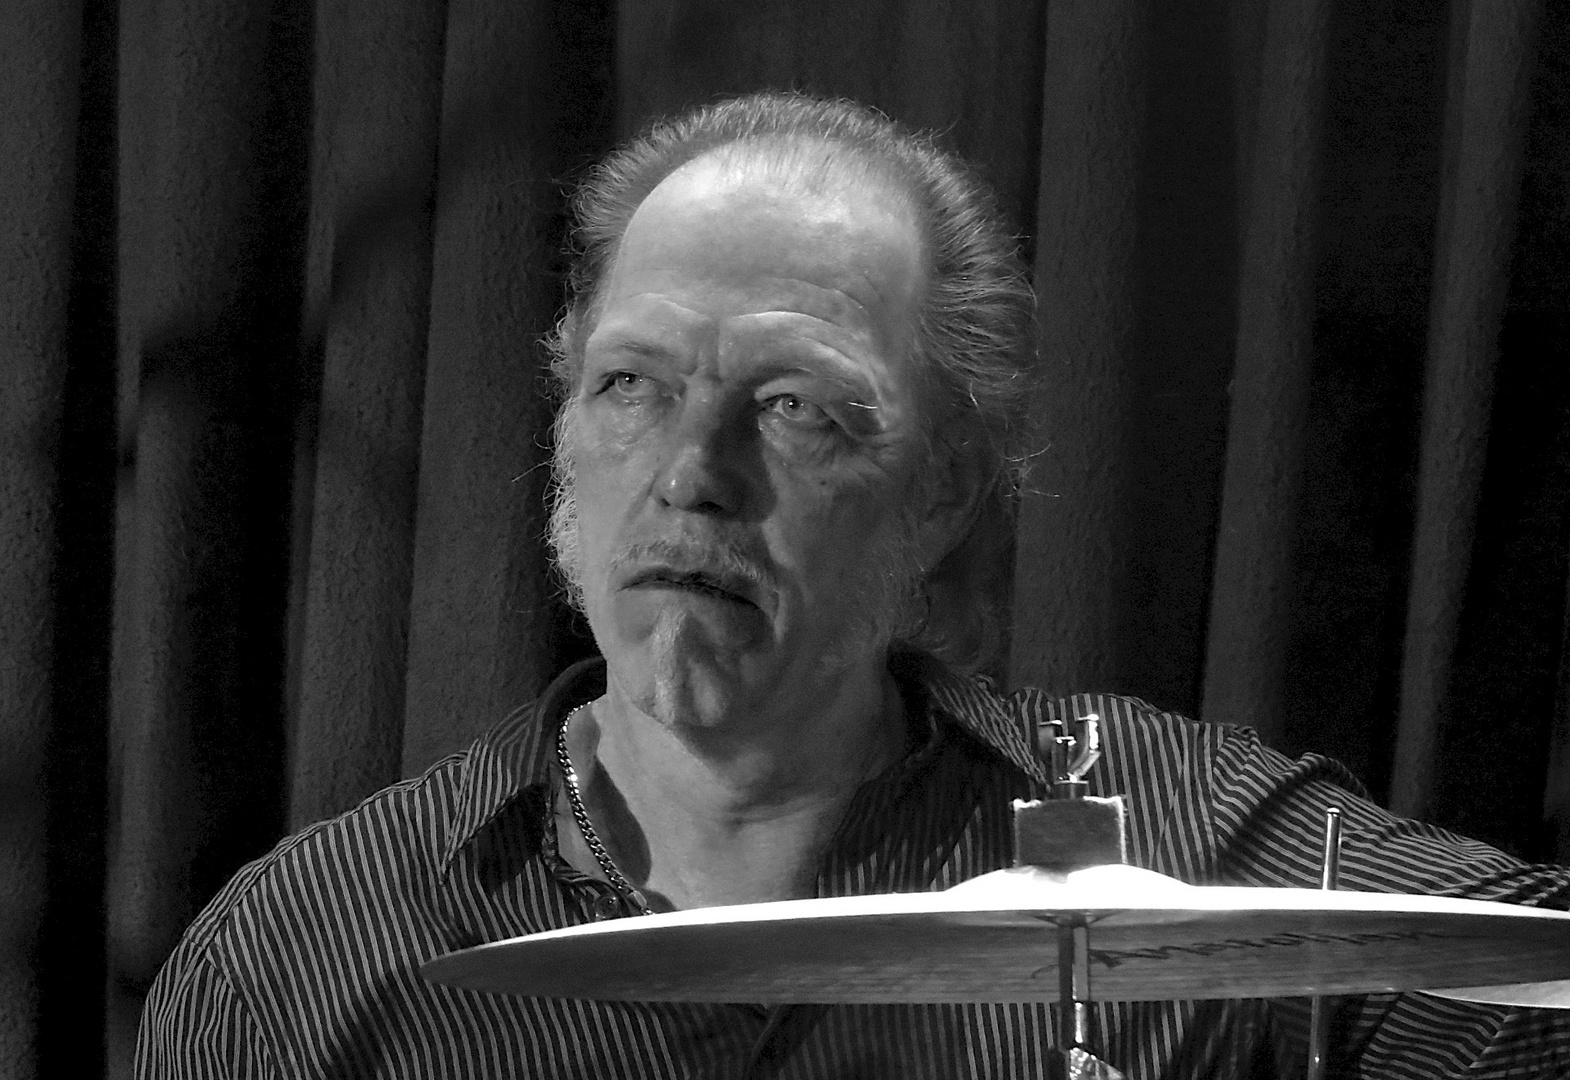 Hans Wallbaum